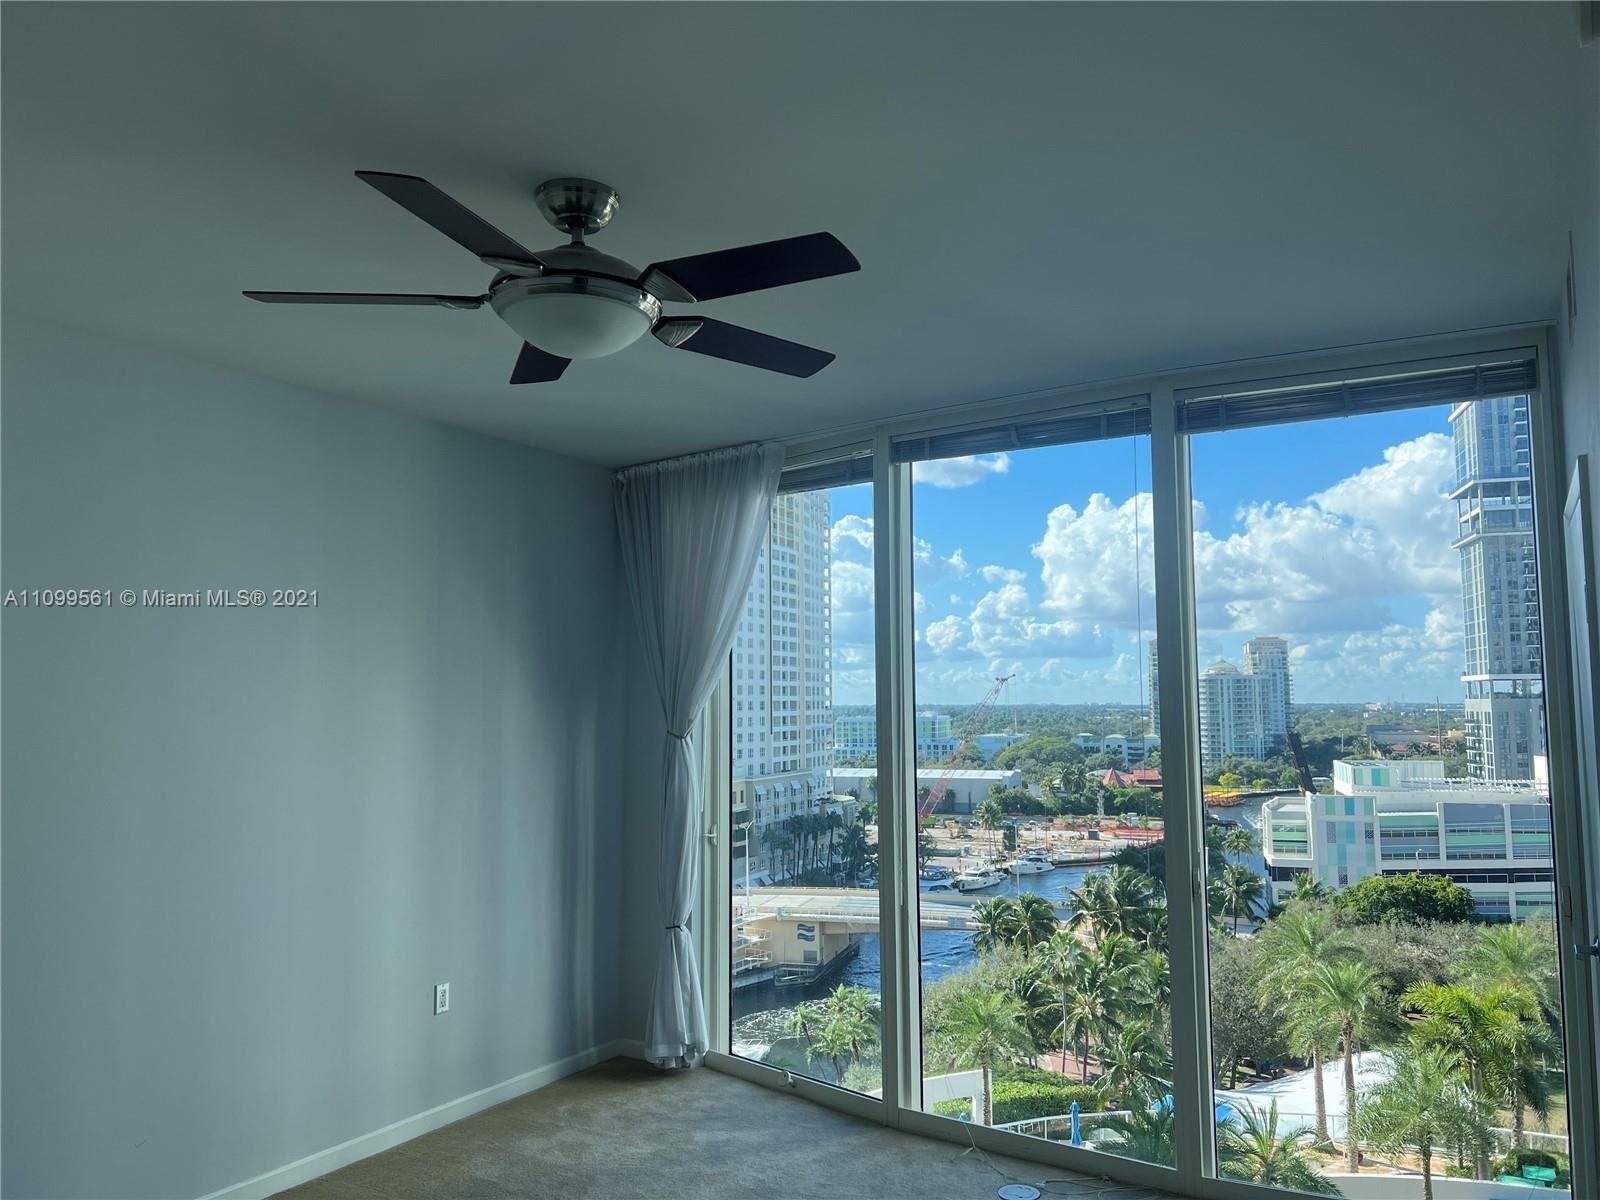 Photo of 333 LAS OLAS WY #1207, Fort Lauderdale, FL 33301 (MLS # A11099561)